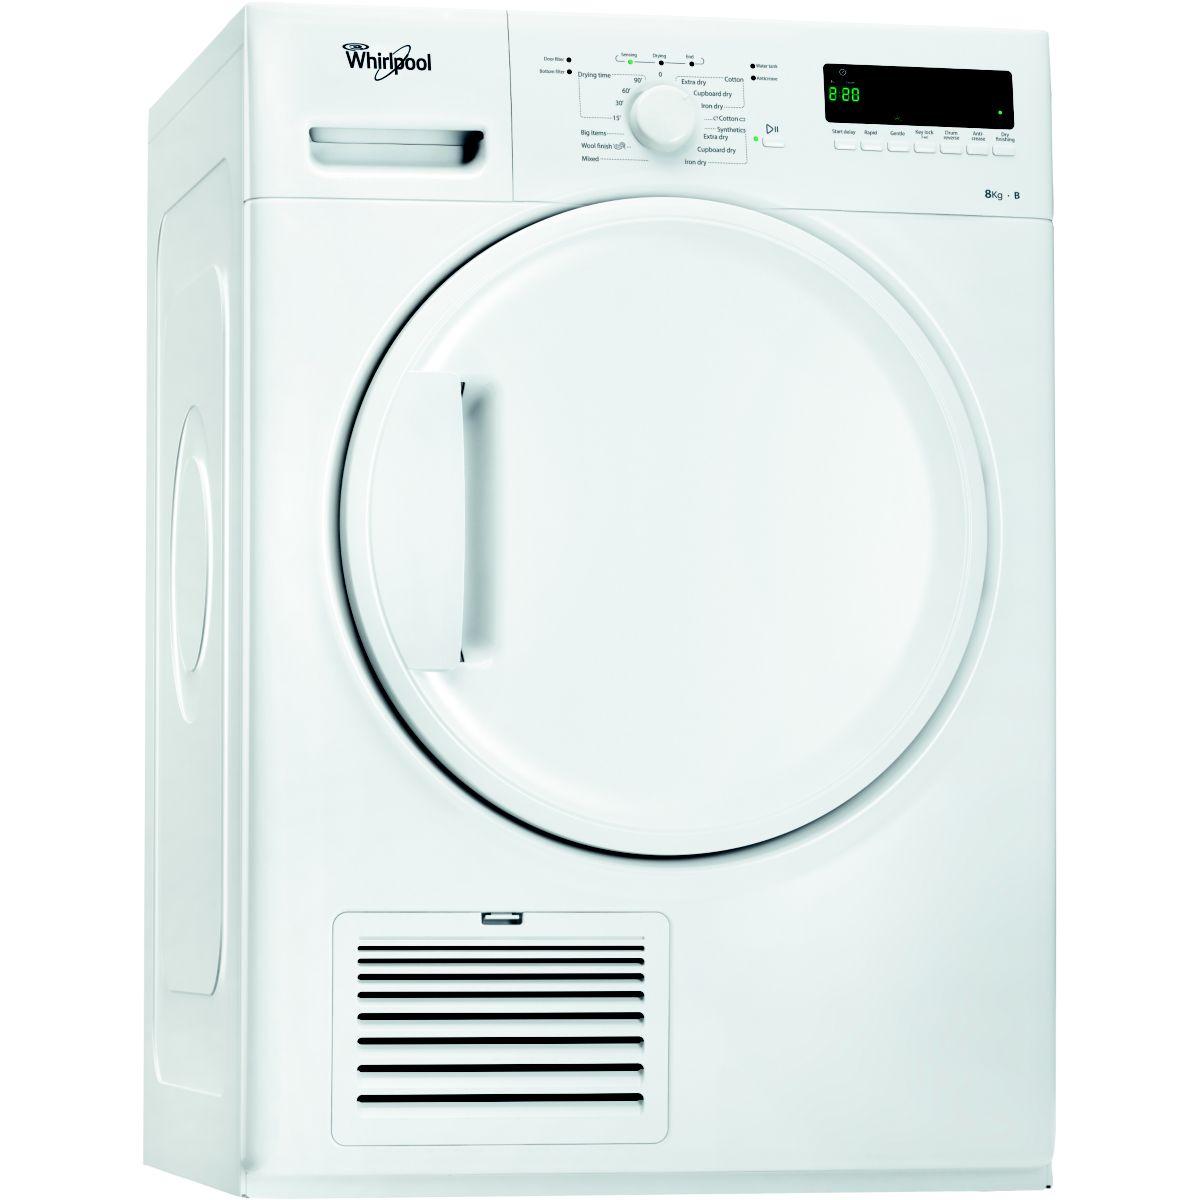 s che linge condensation whirlpool ddlx 80110 r f. Black Bedroom Furniture Sets. Home Design Ideas